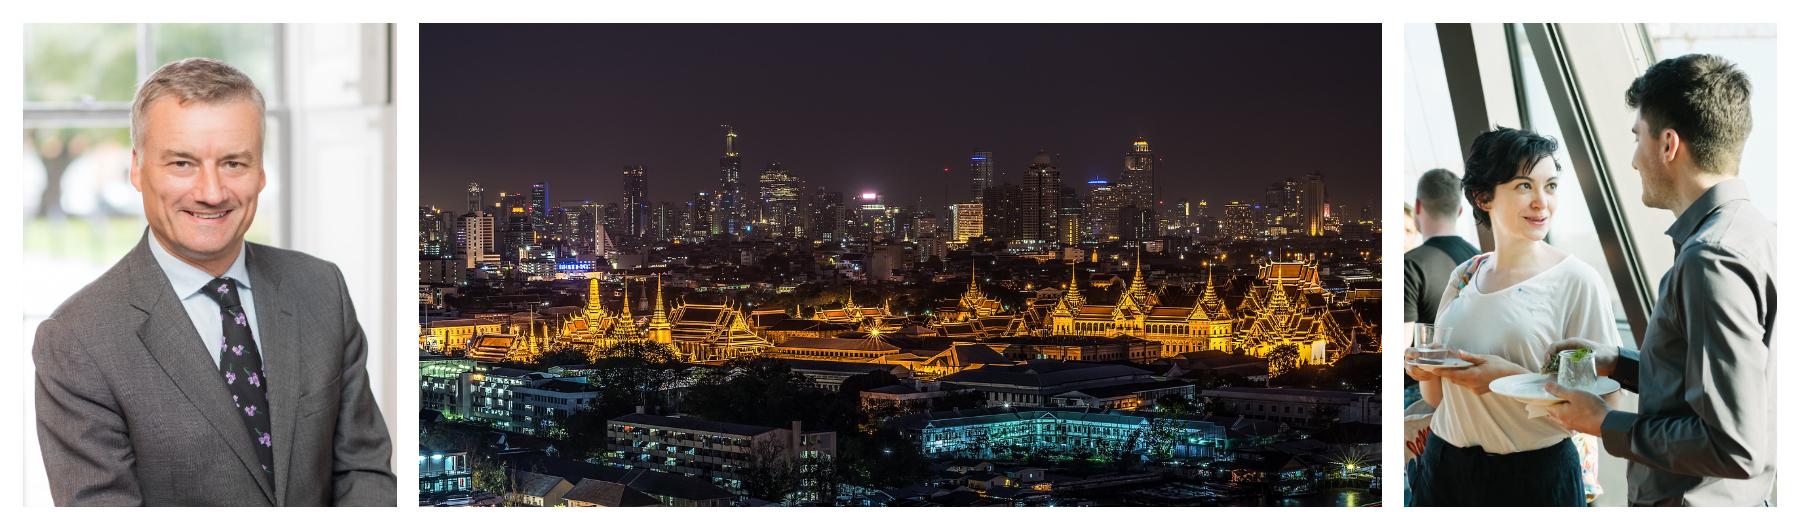 Meet-up for Alumni & Friends in Thailand